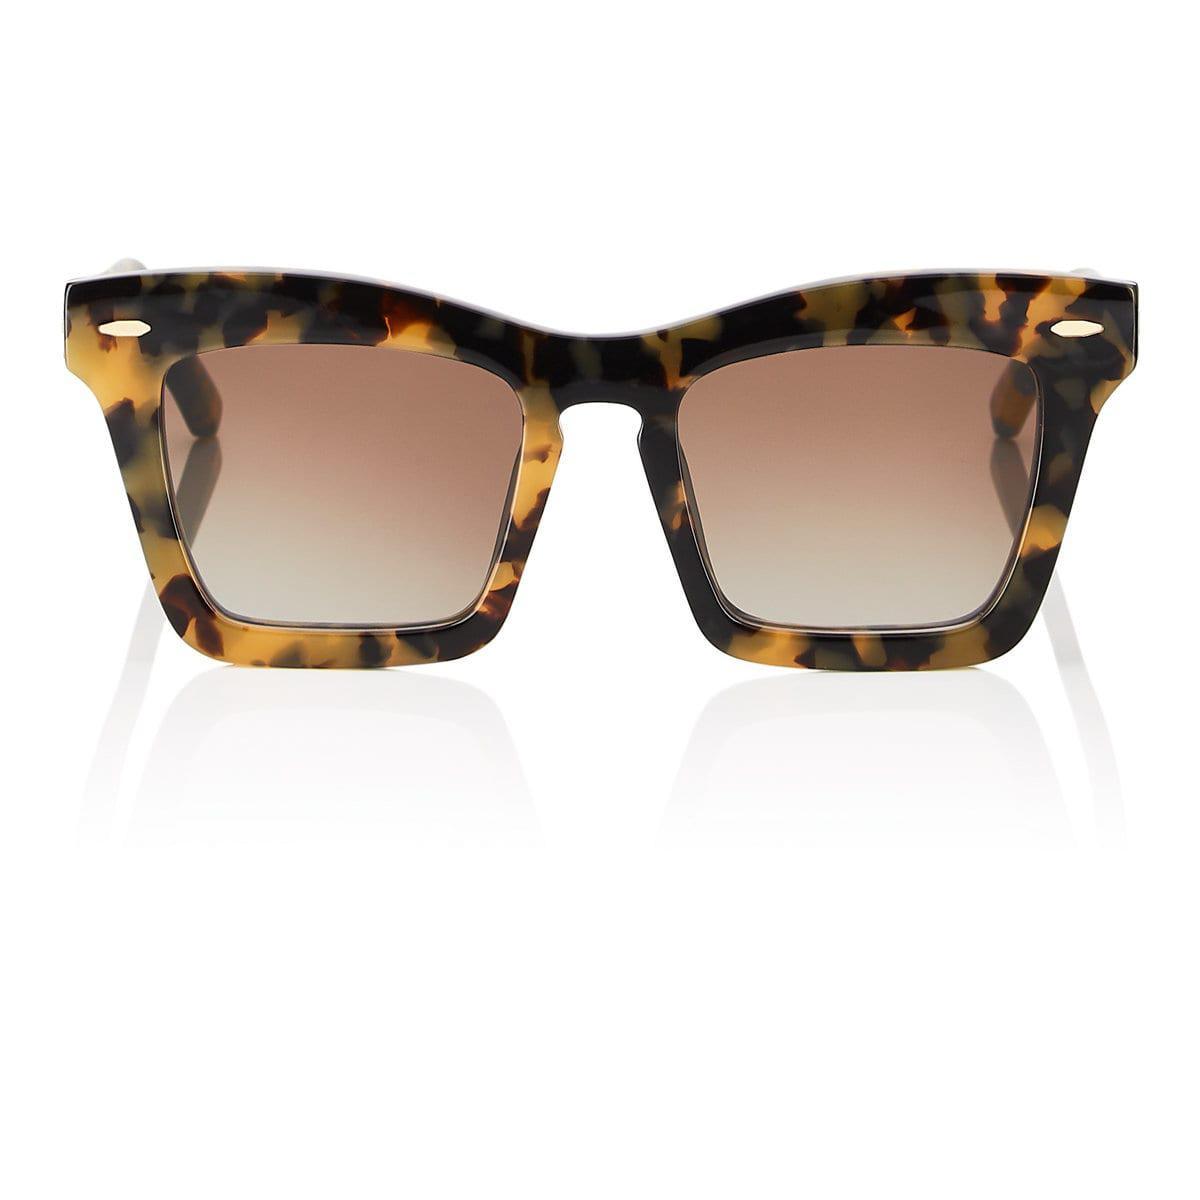 Banks tortoiseshell acetate sunglasses Karen Walker Eyewear 6P1Rw3P6